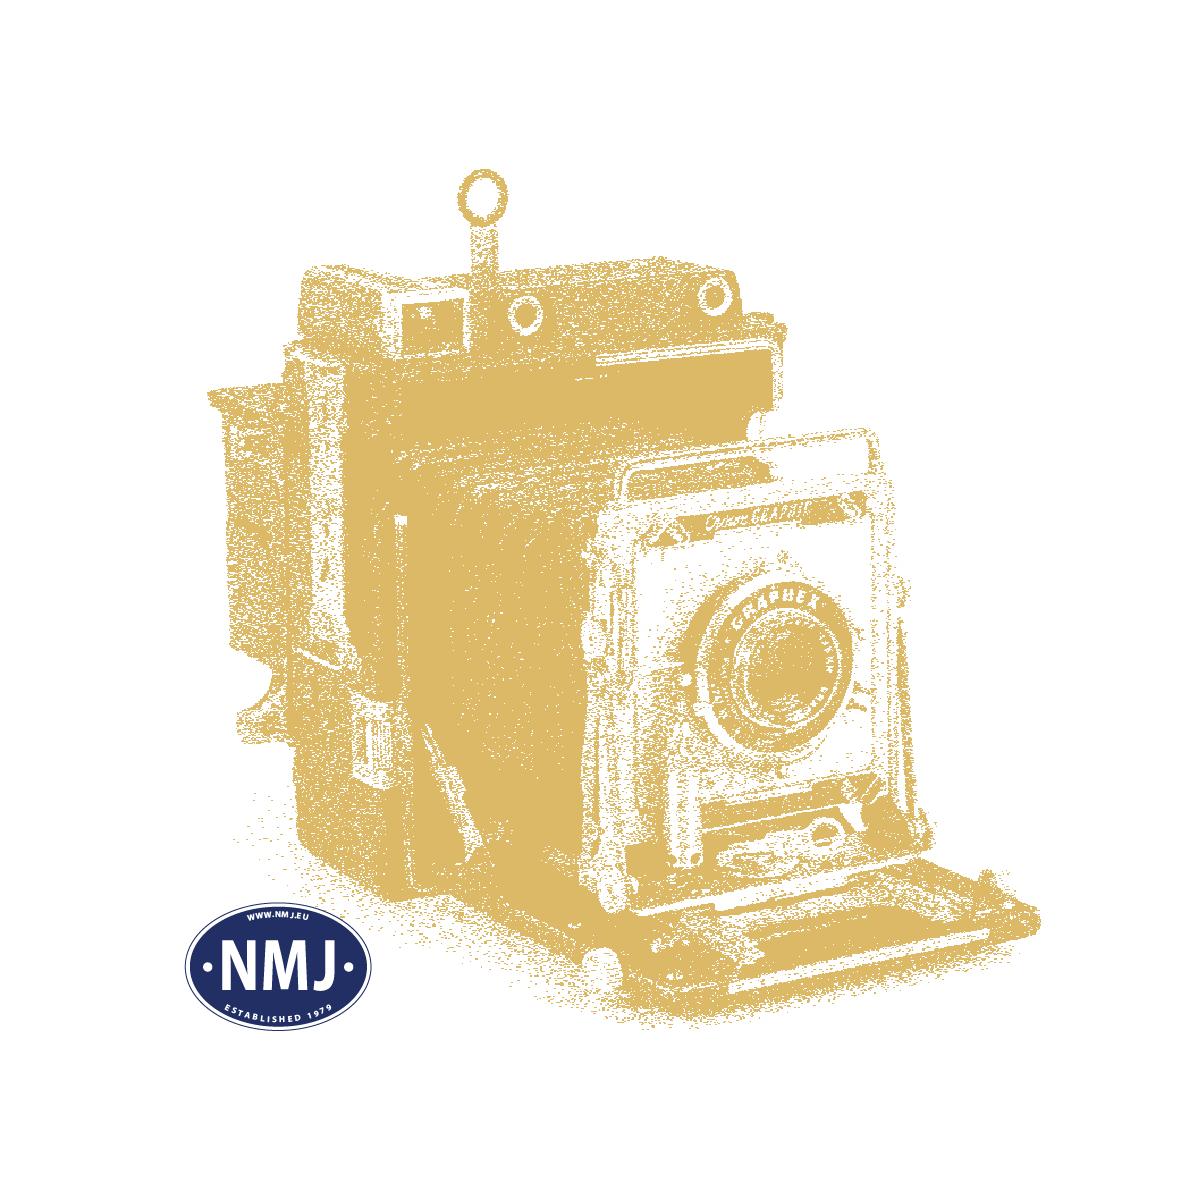 NMJ0.21310 - NMJ Superline NSB DF37.21310, 0-Scala